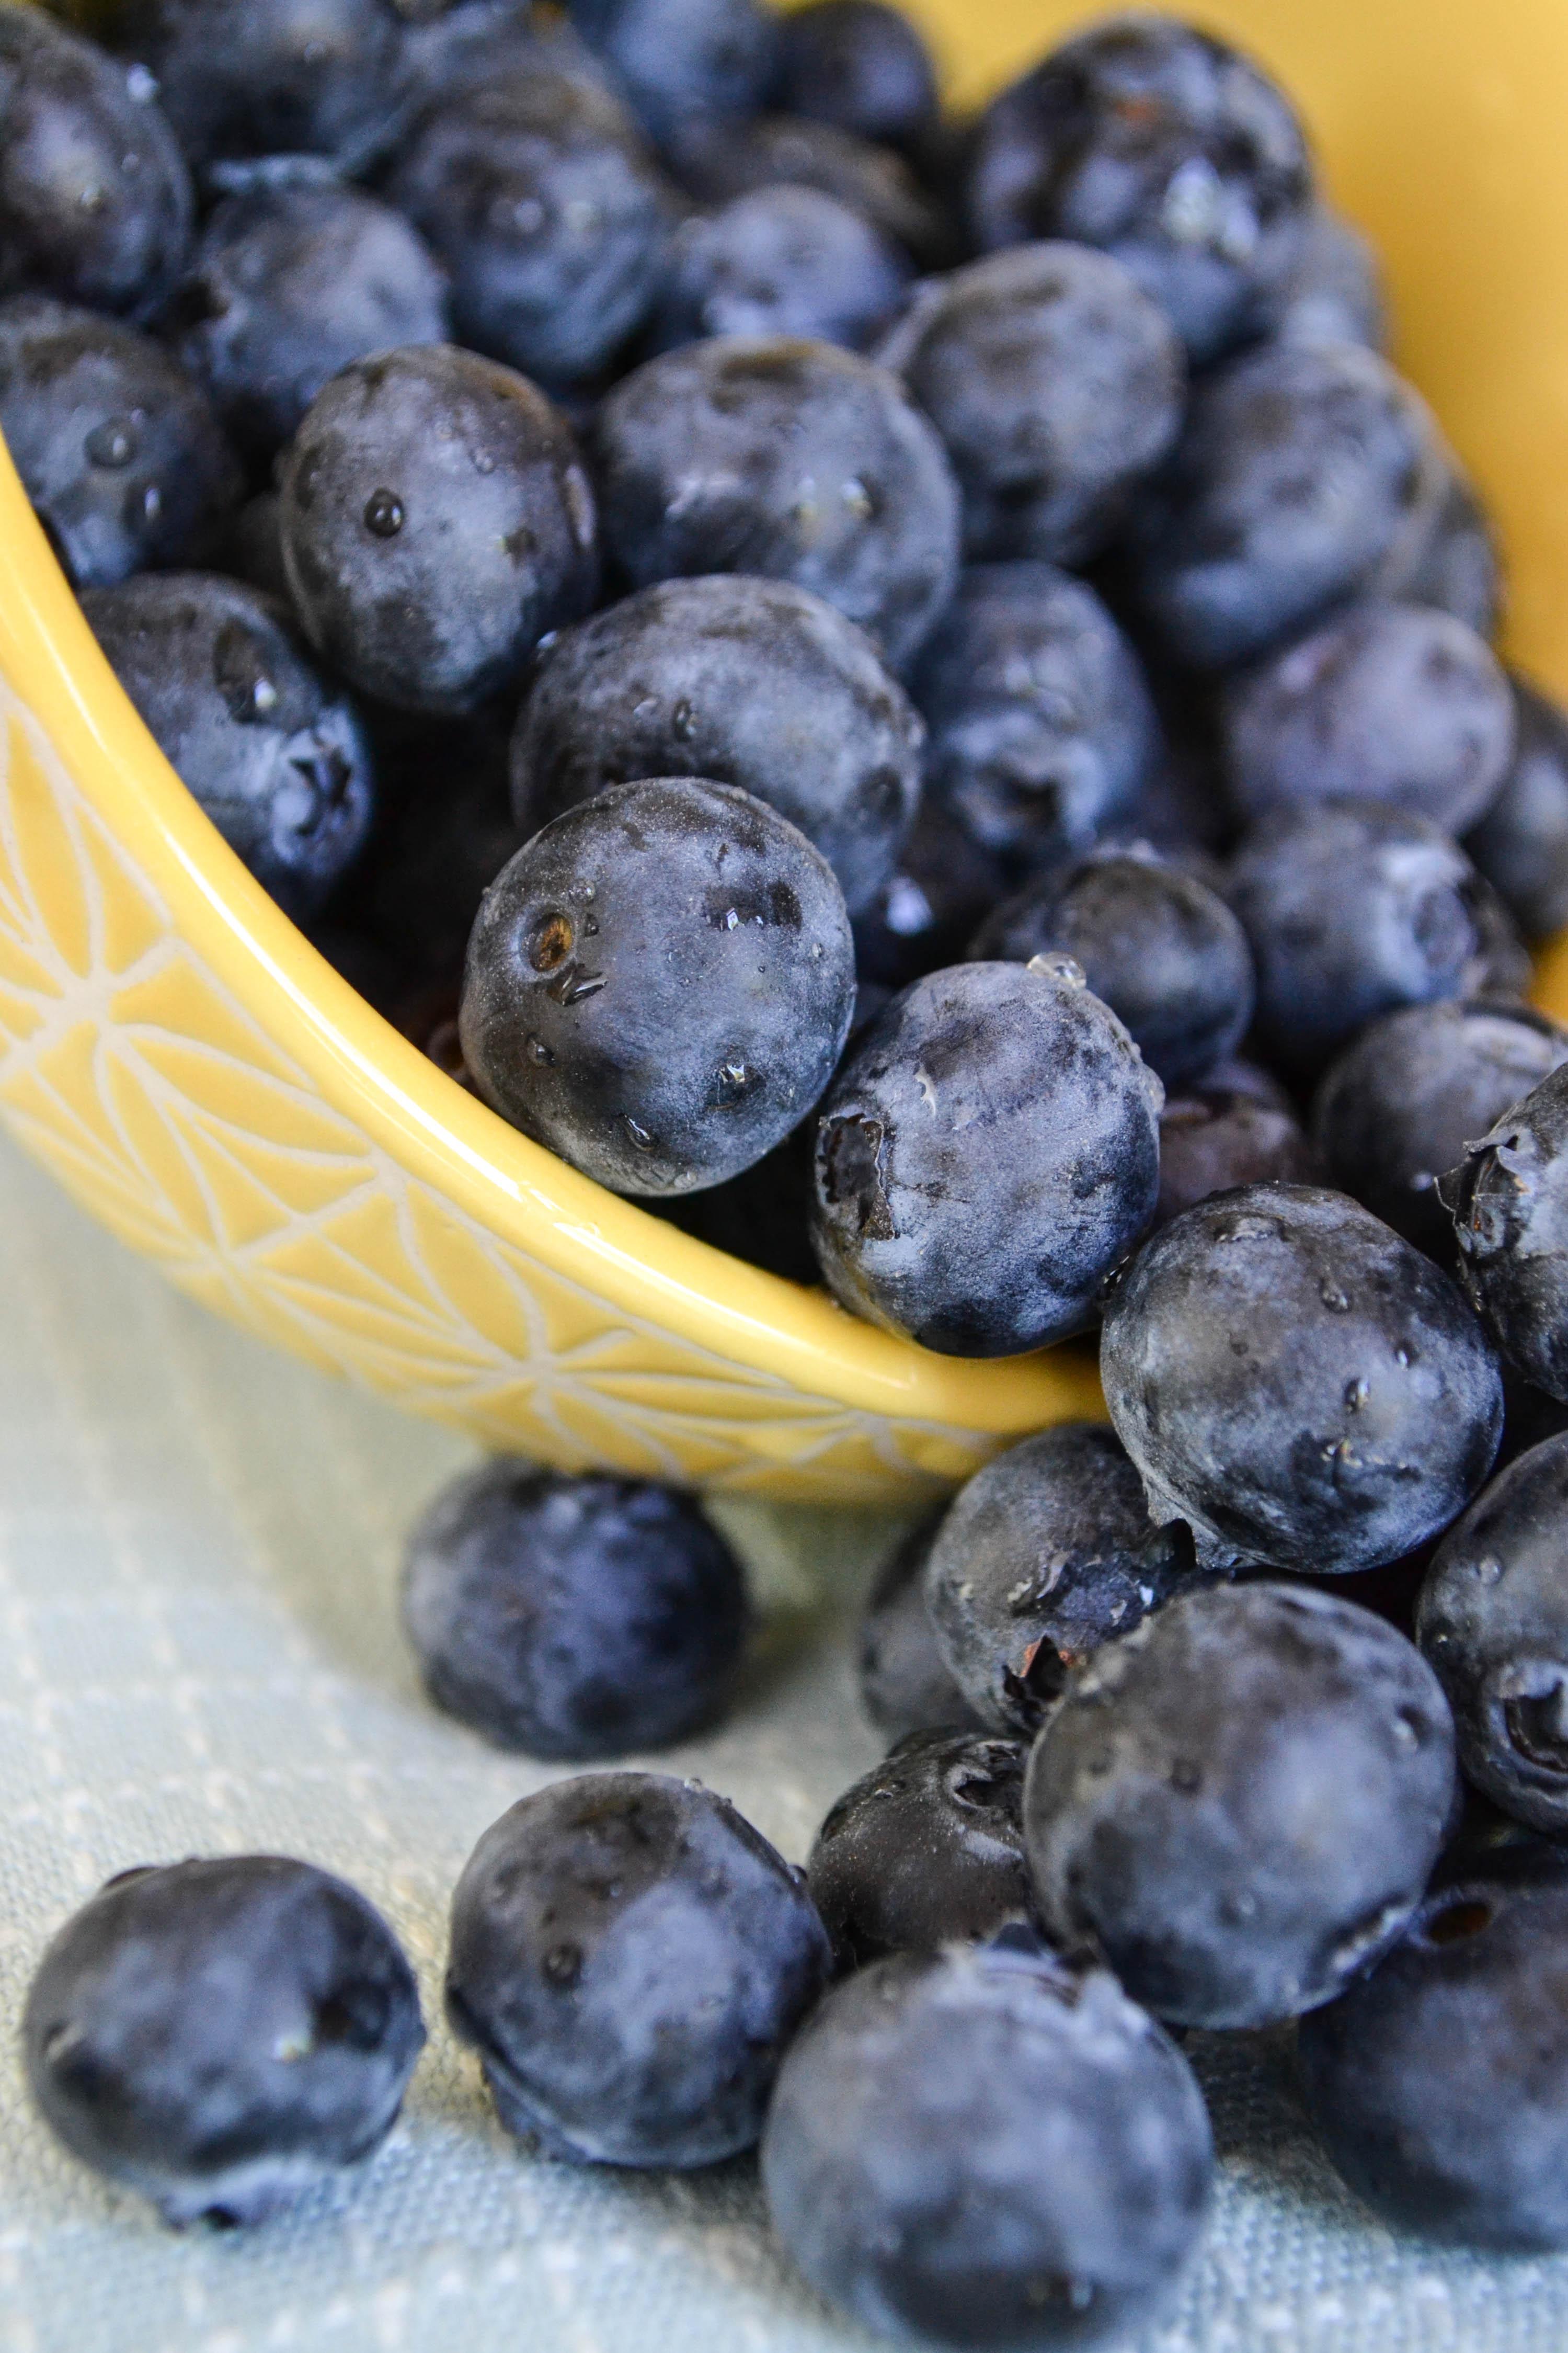 plant fruit berry food produce blueberry 1168002 pxhere.com